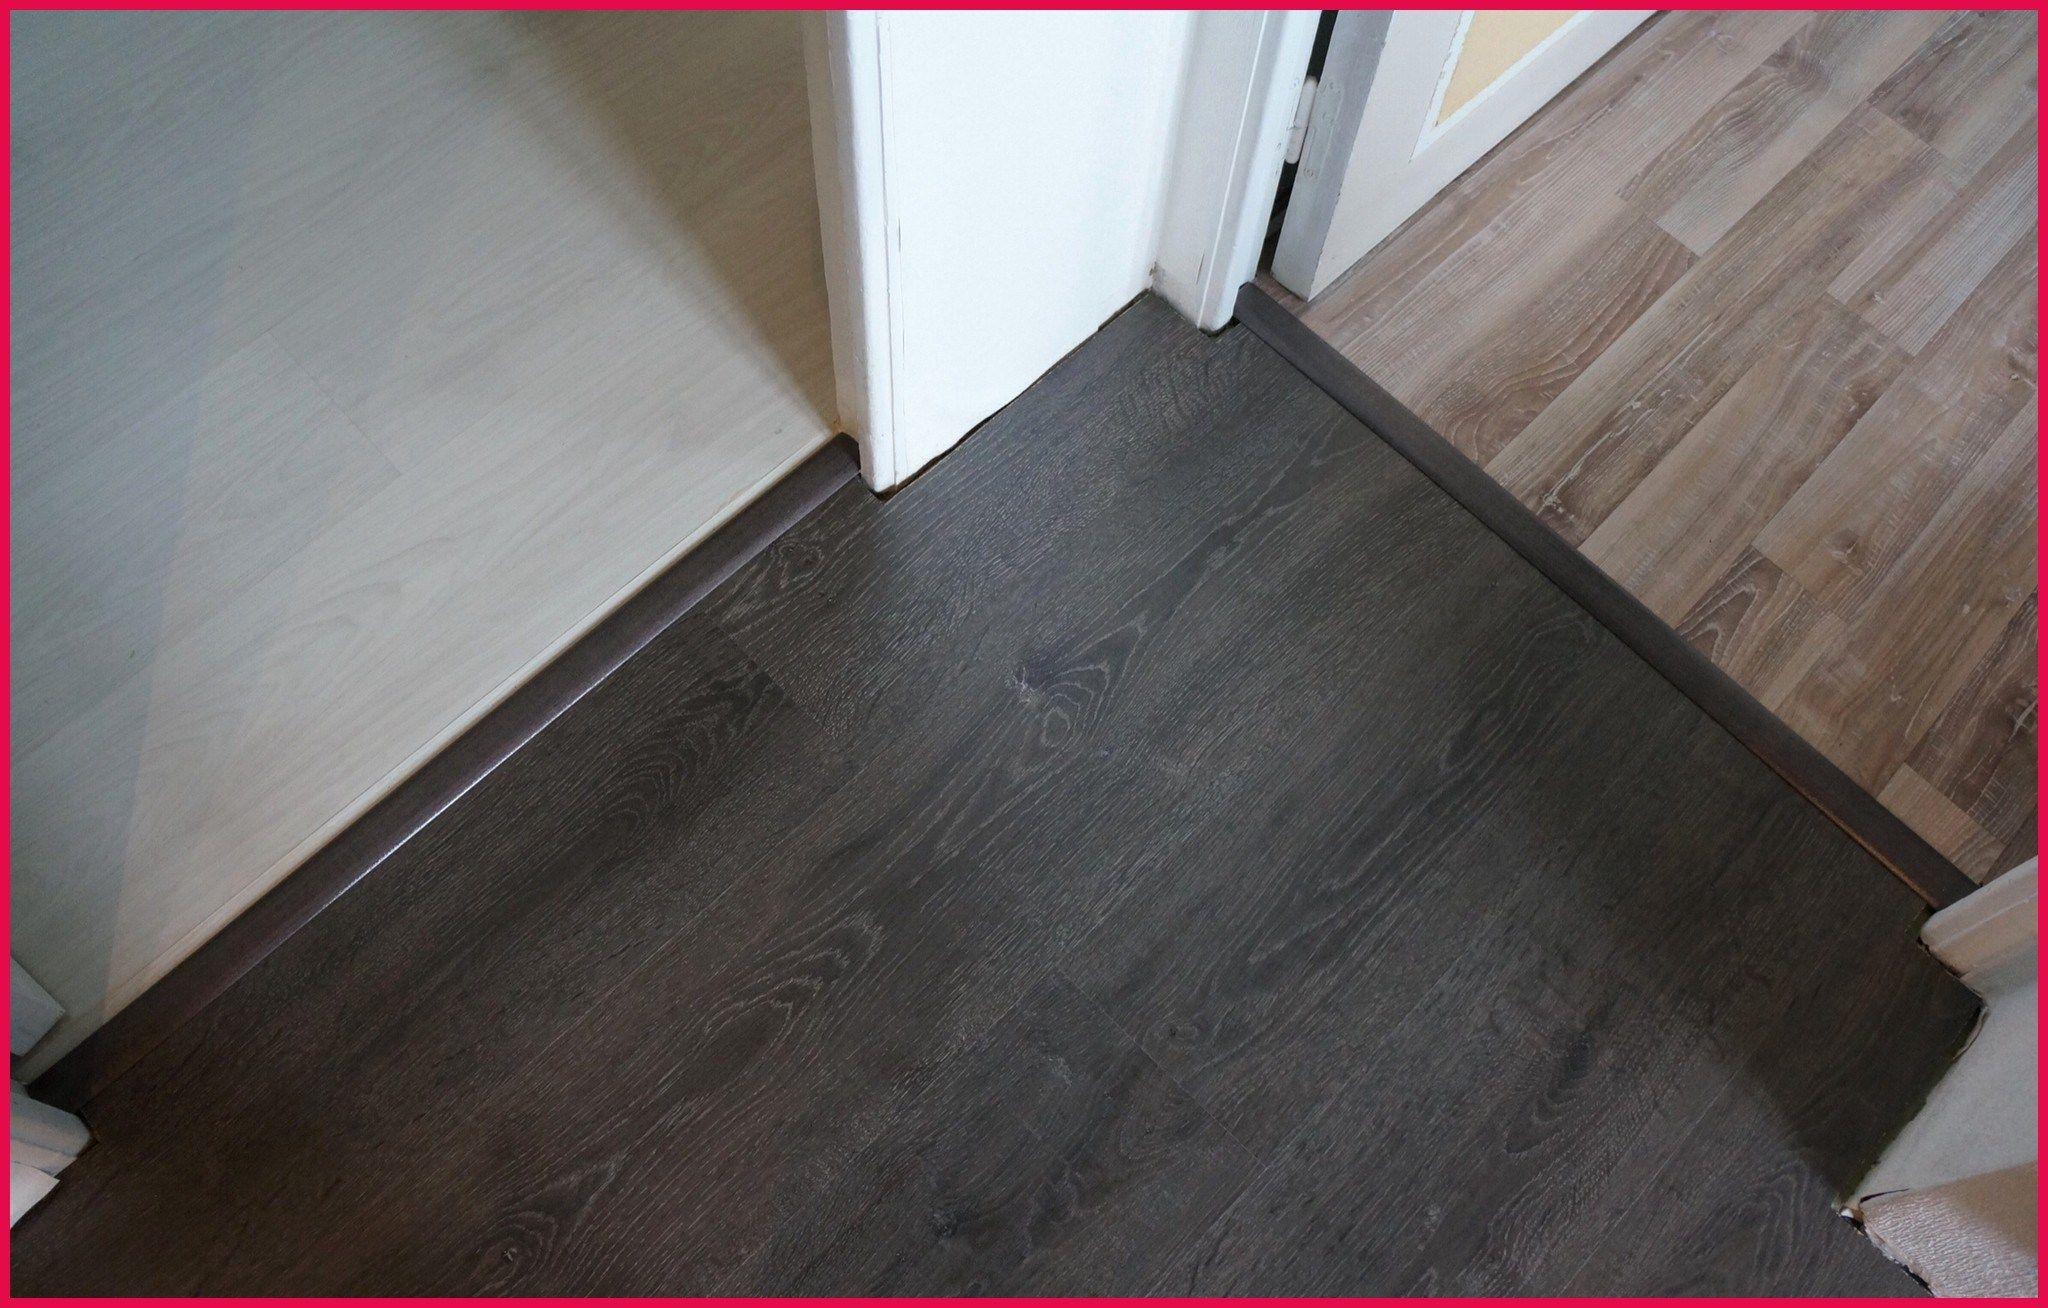 Best Of Pose Barre De Seuil Parquet Flottant Hardwood Flooring Hardwood Floors